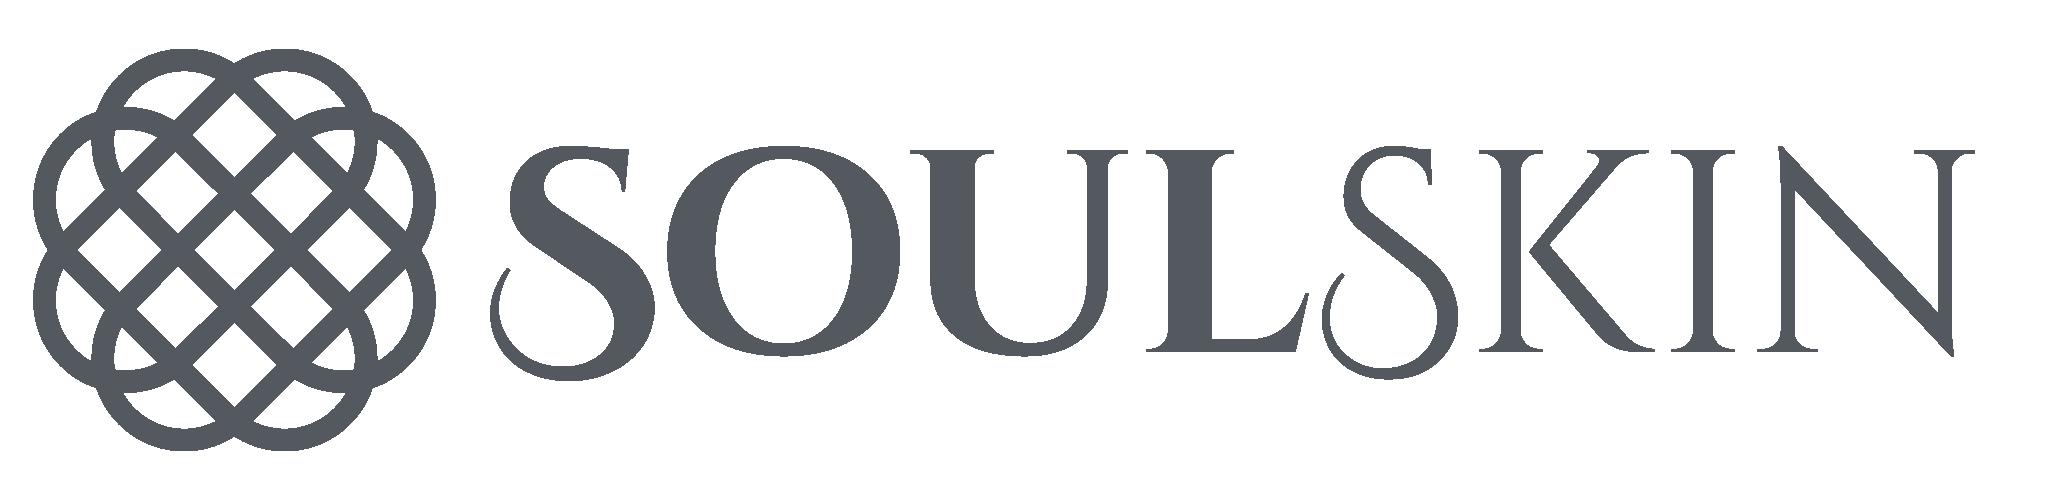 soulskin logo dark